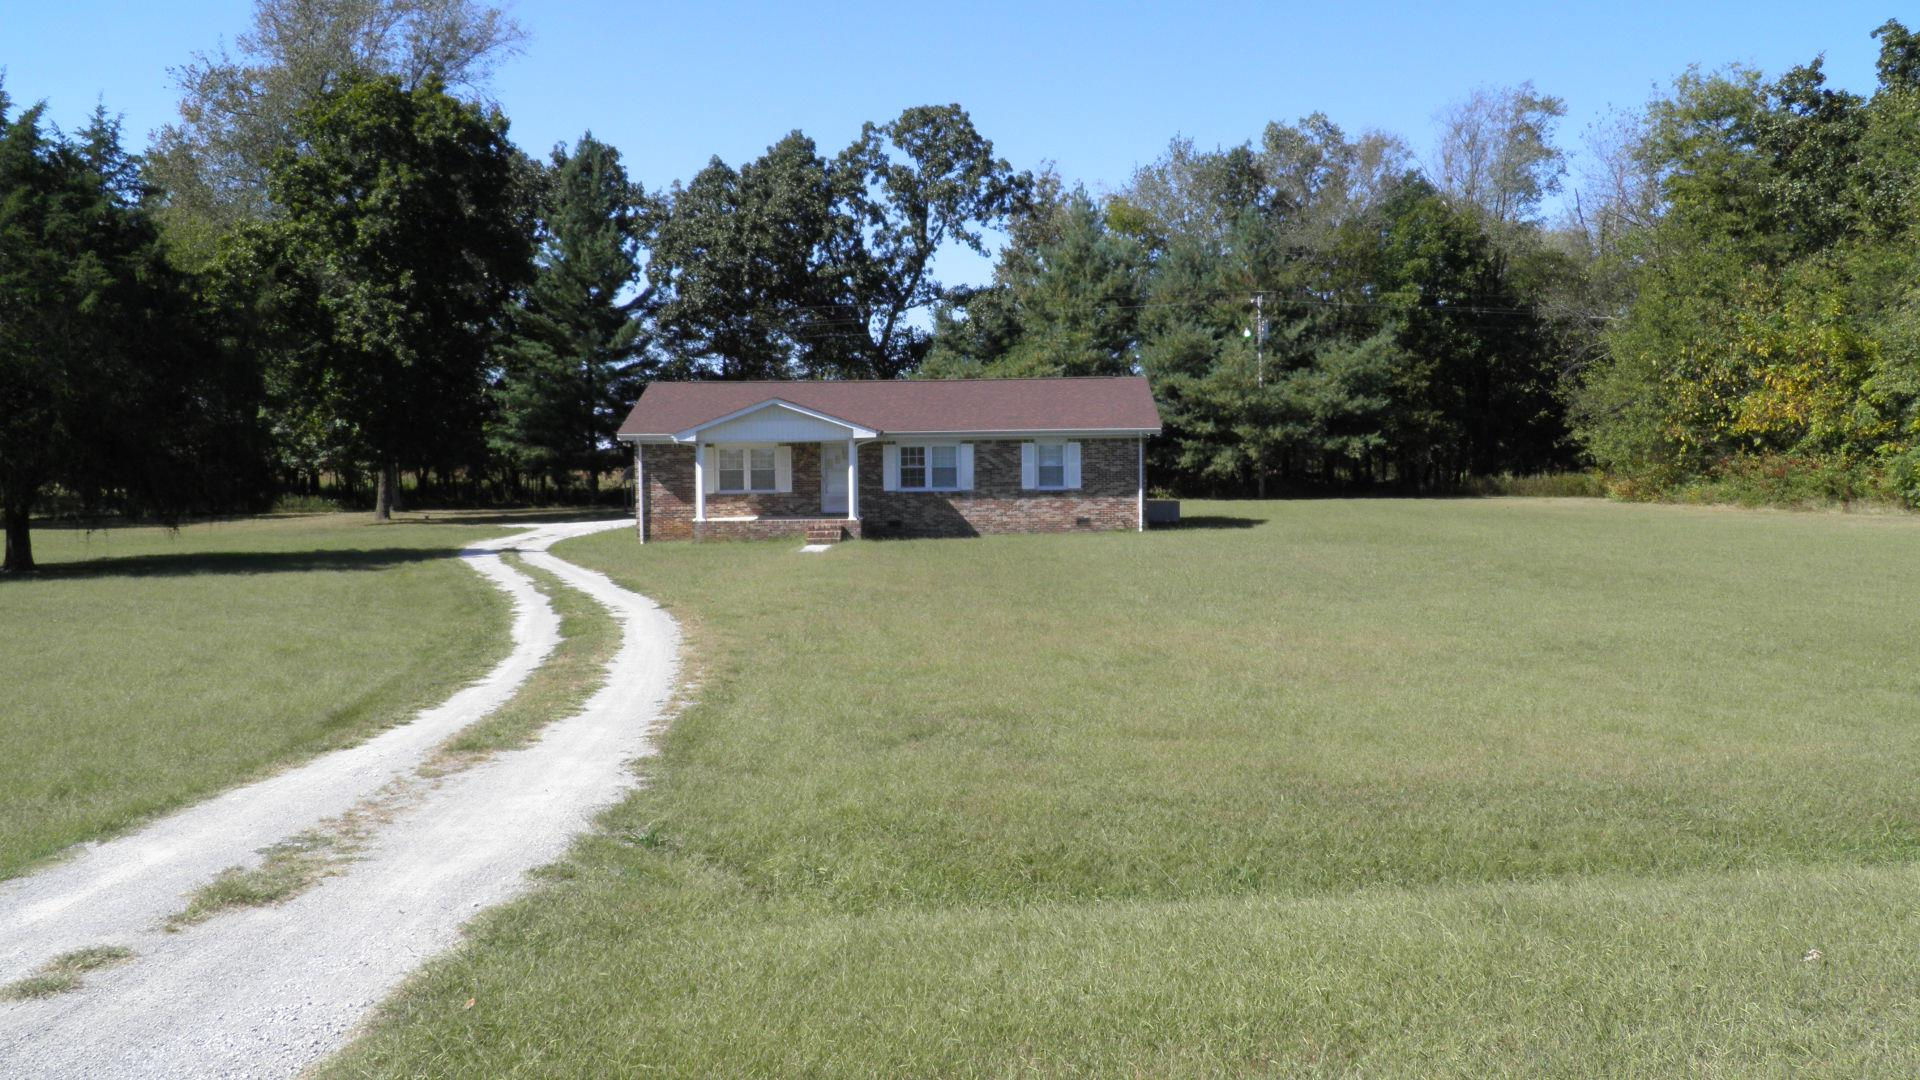 13910 Hillsboro Hwy, Hillsboro, TN 37342 - Hillsboro, TN real estate listing